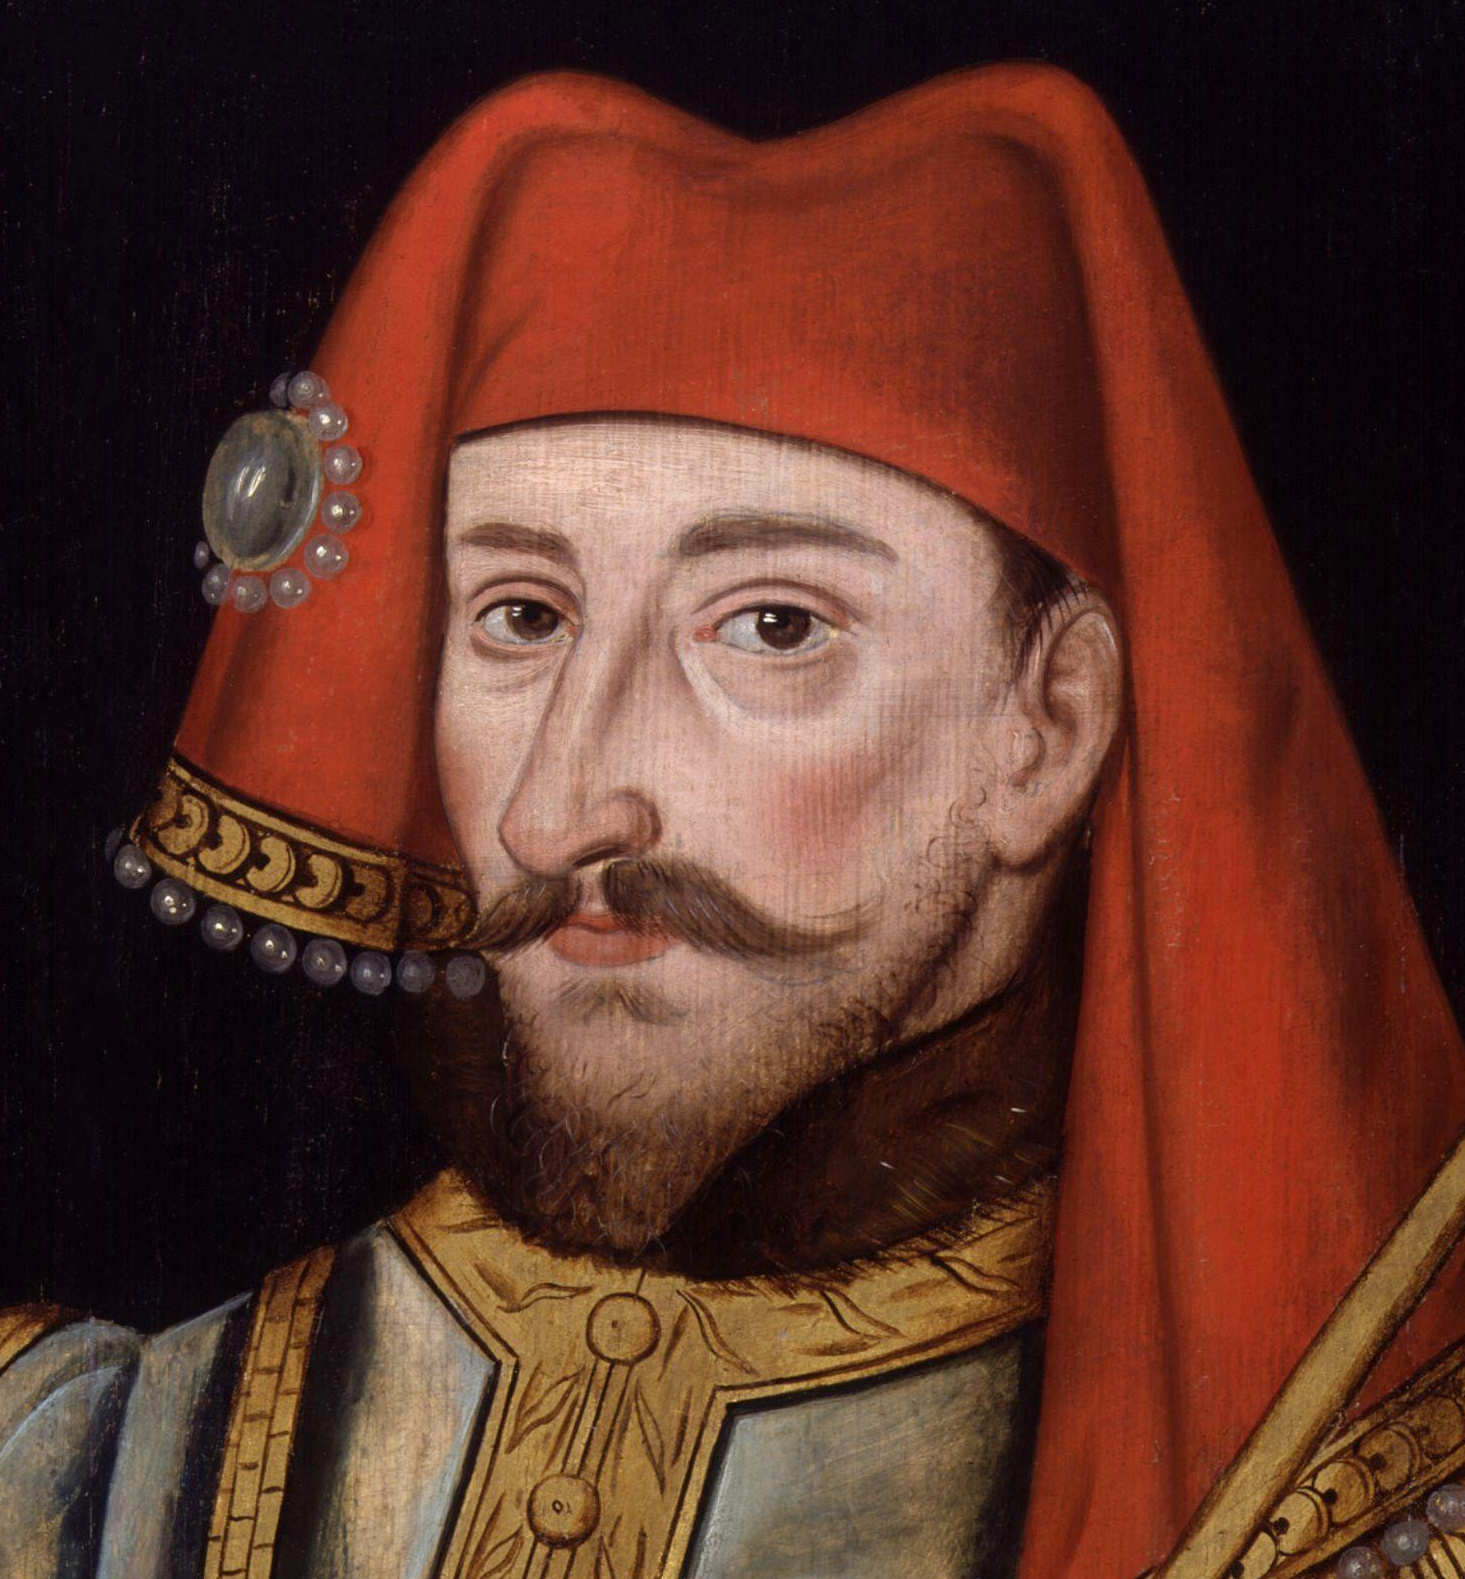 File:Henry4.JPG - Wikimedia Commons